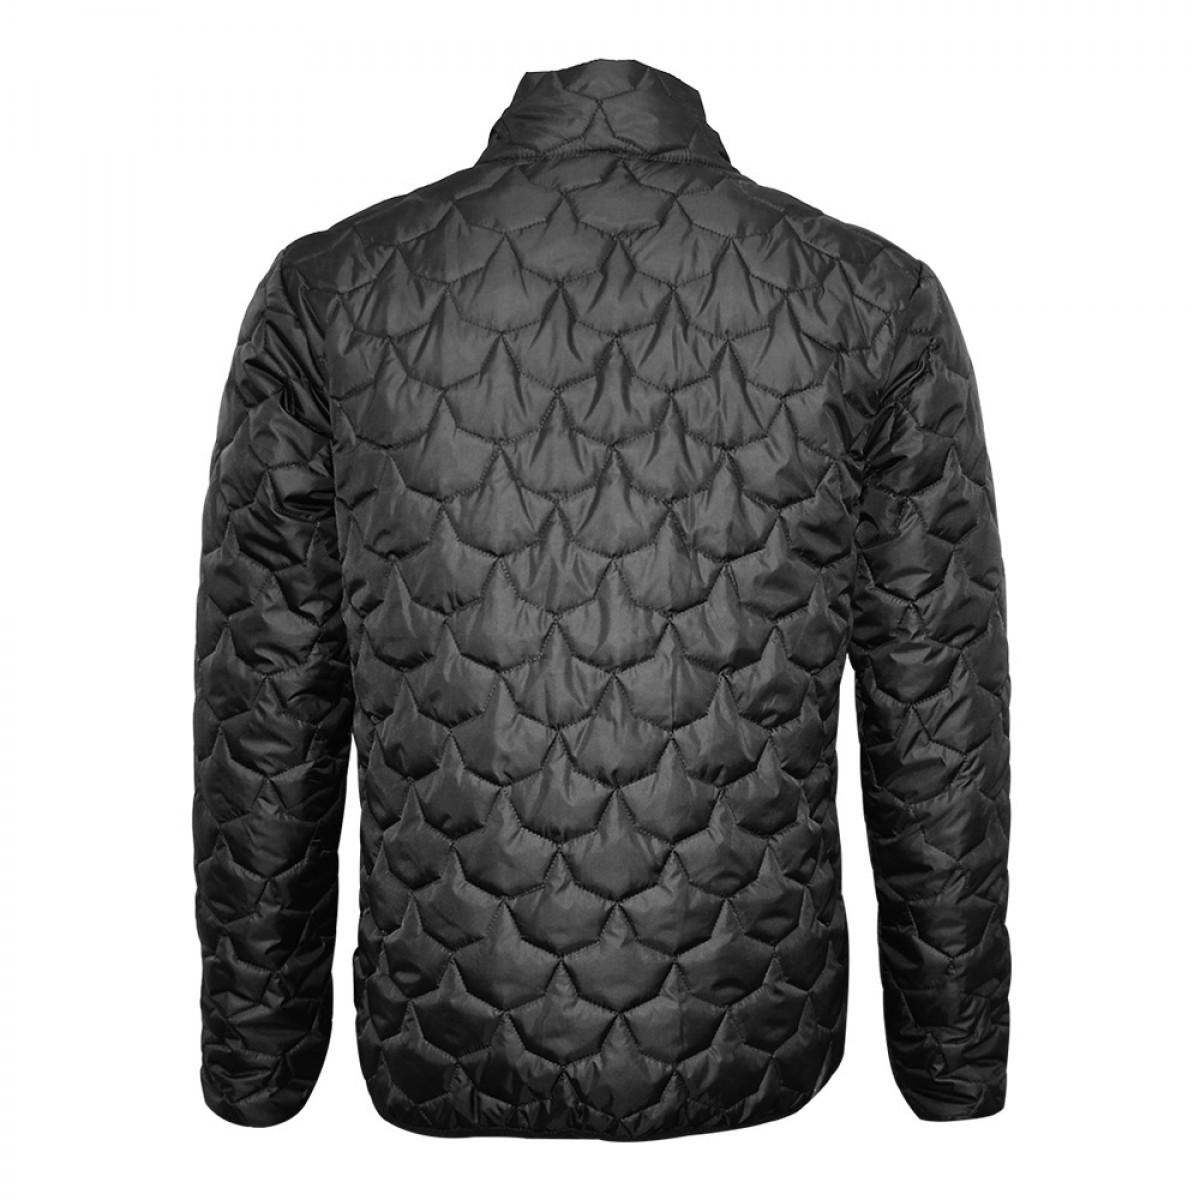 men-polyfiber-jacket-without-hoodie-kpj05911-8a